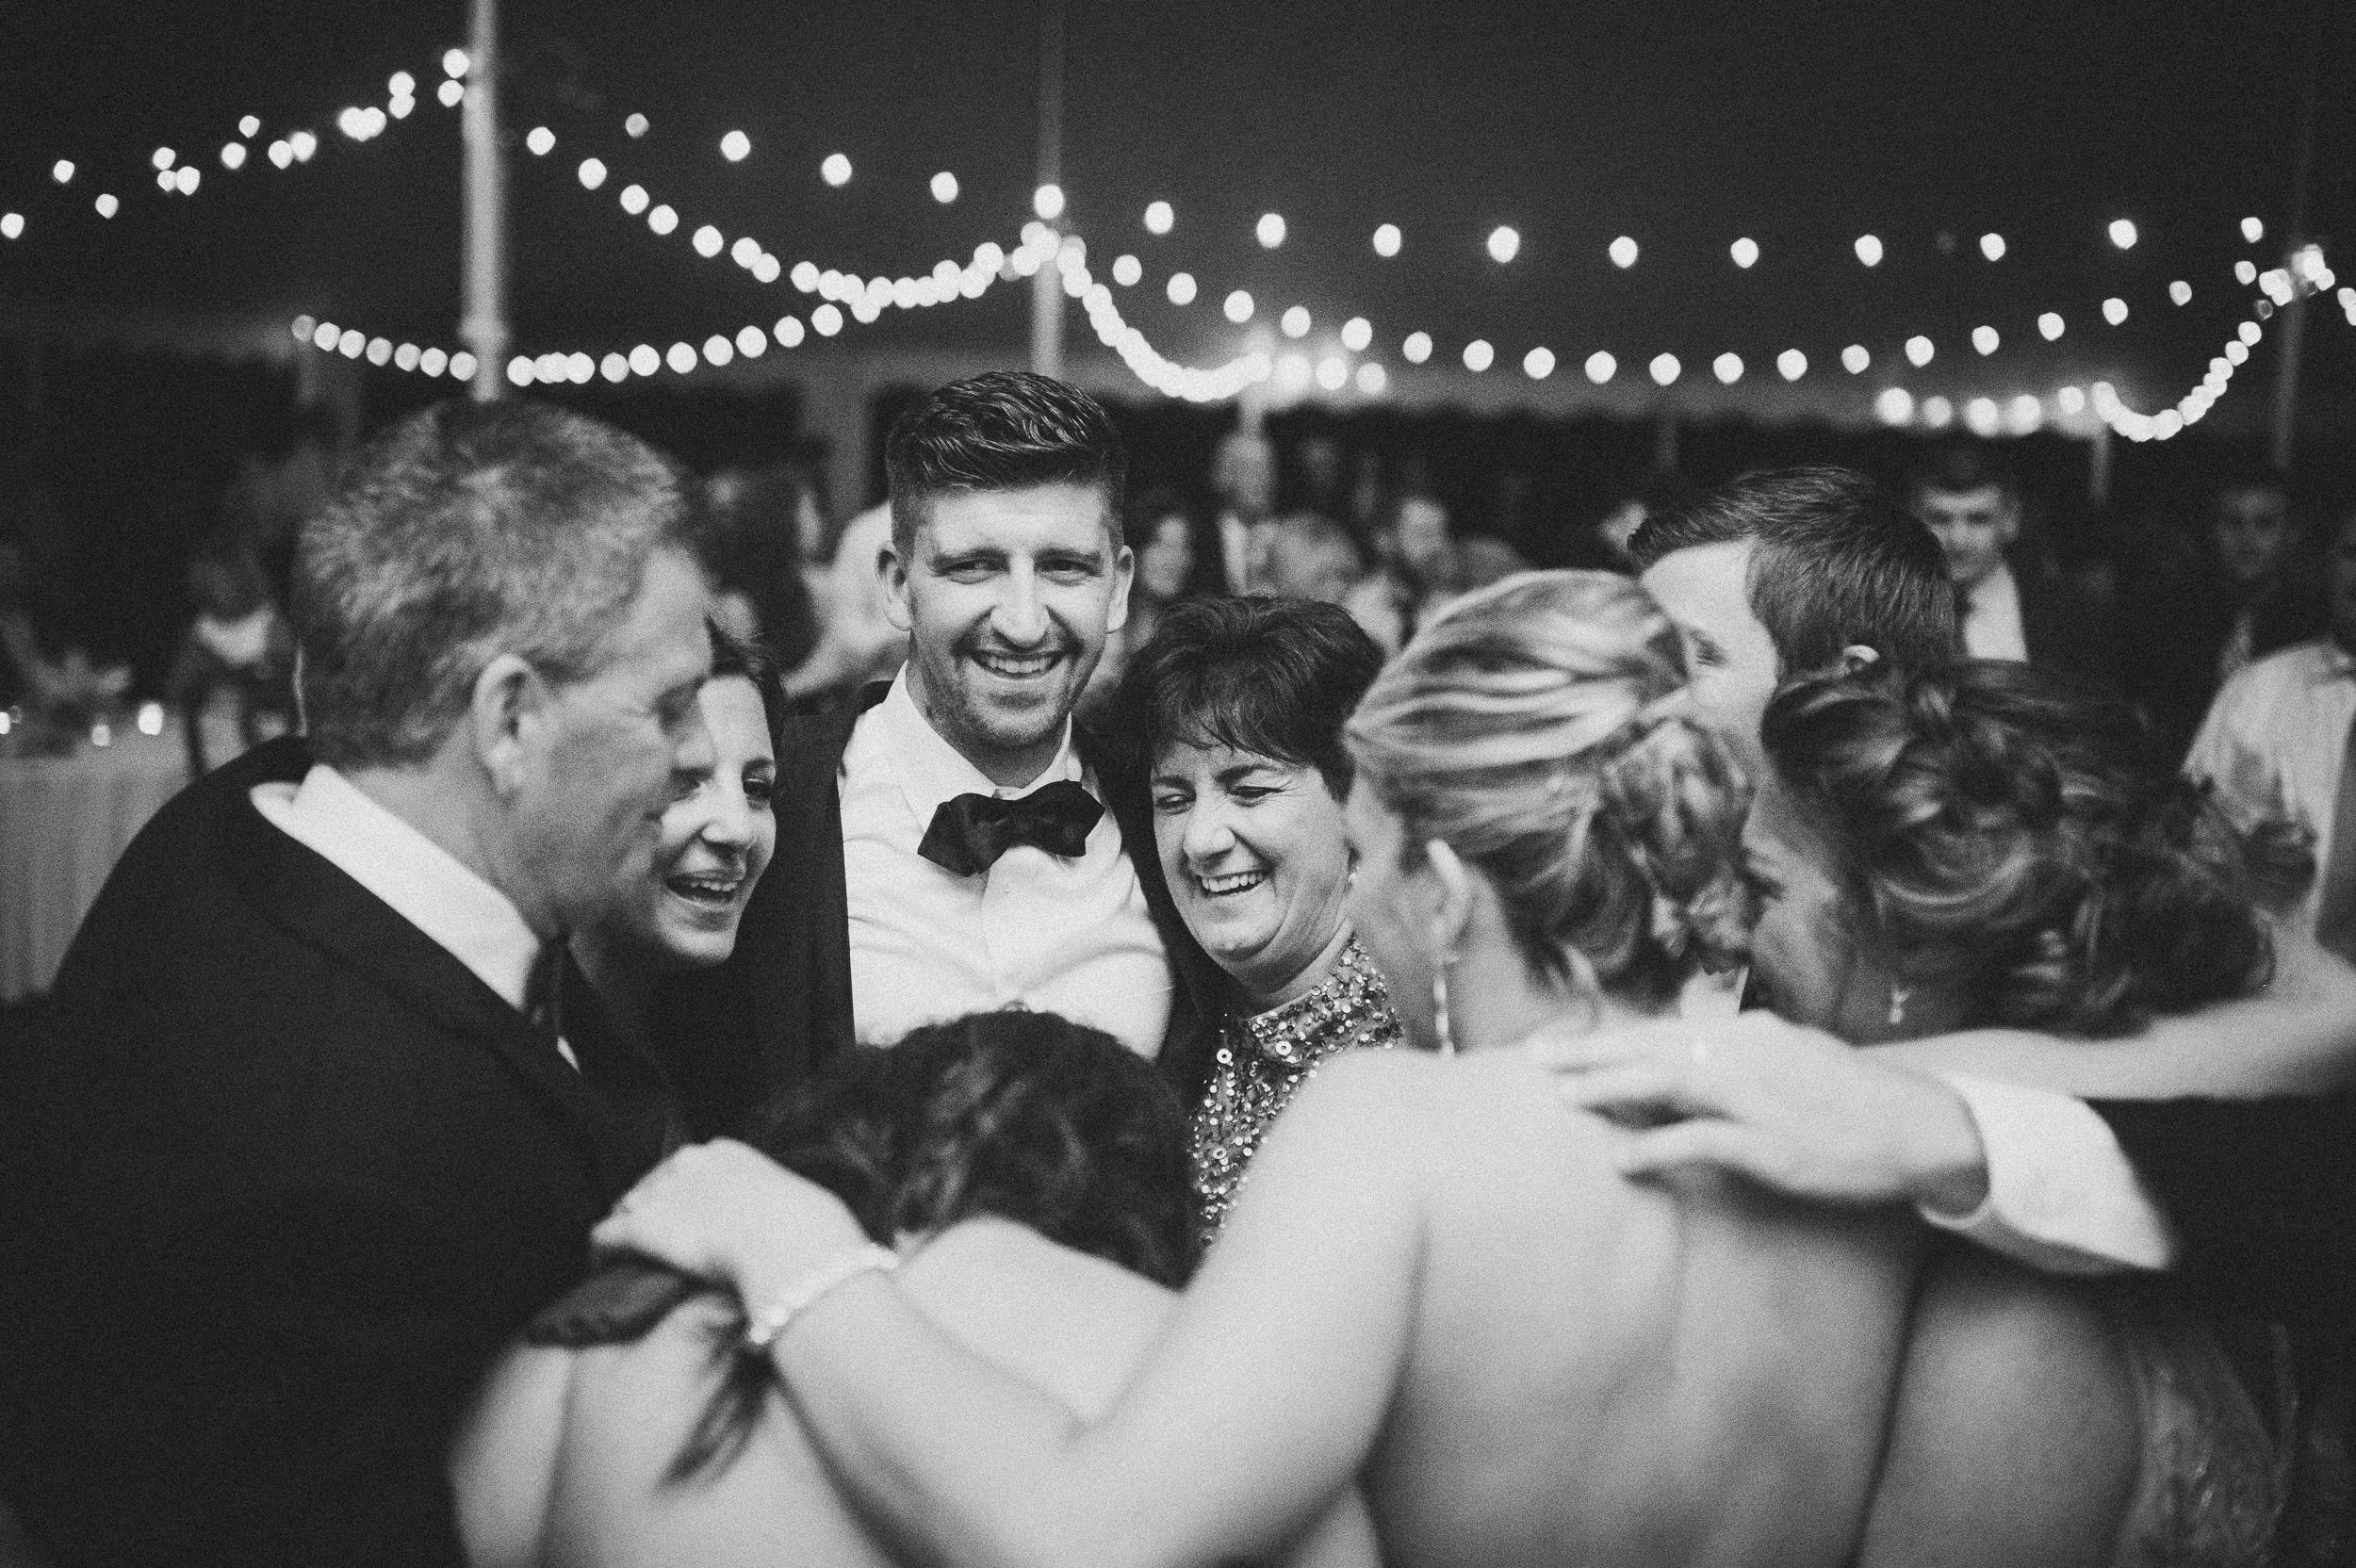 delaware-estate-wedding-photographer-pat-robinson-photography-126.jpg